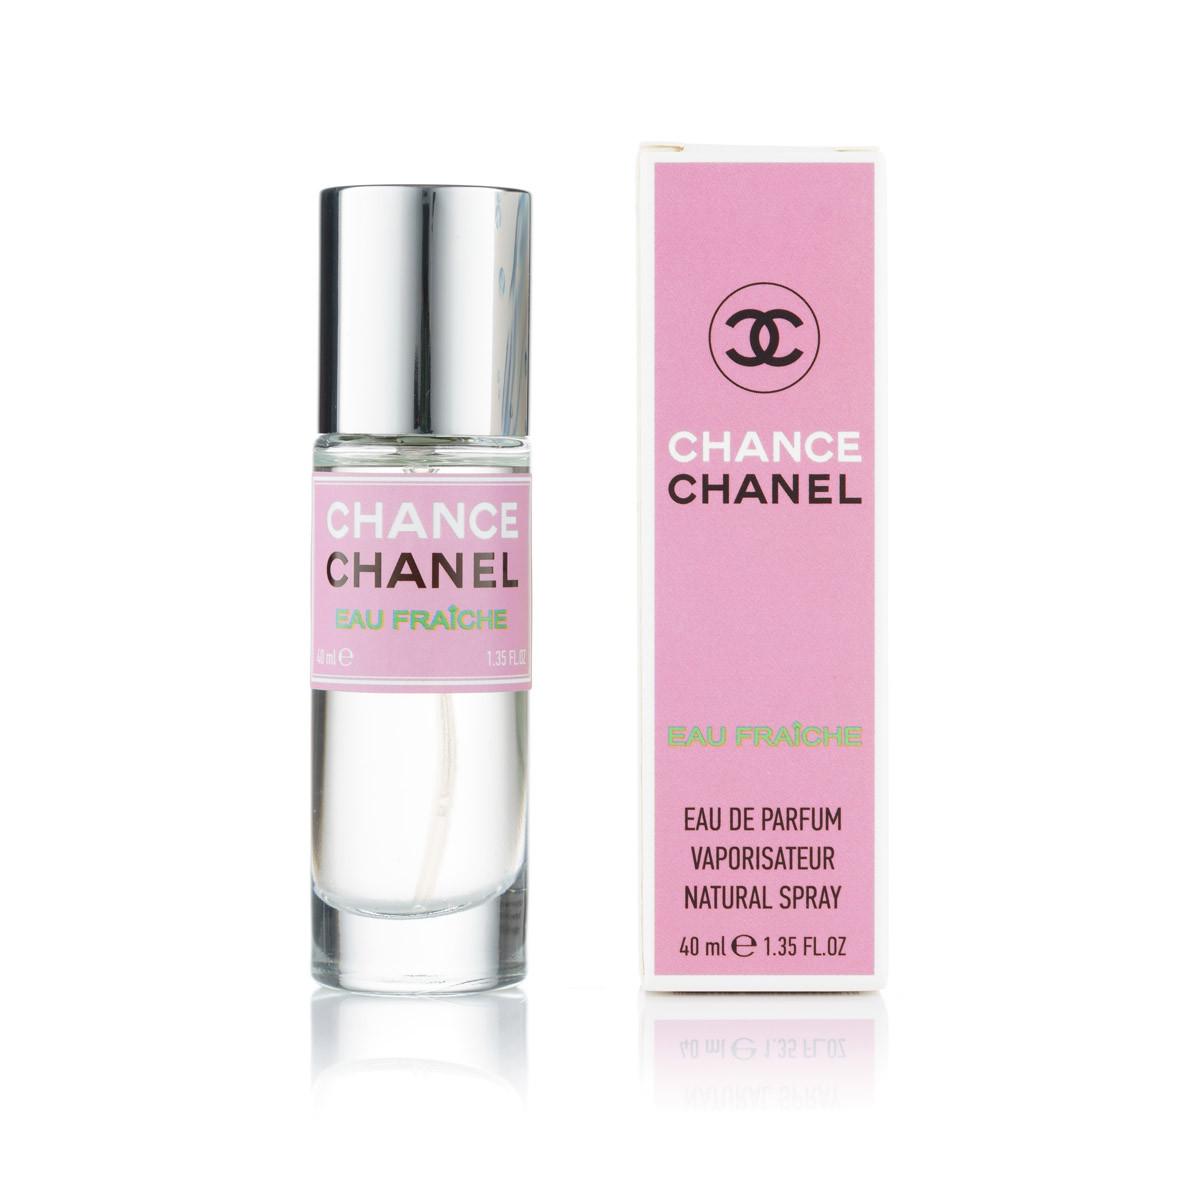 40 мл мини парфюм Chance Eau Fraiche - Ж (320)